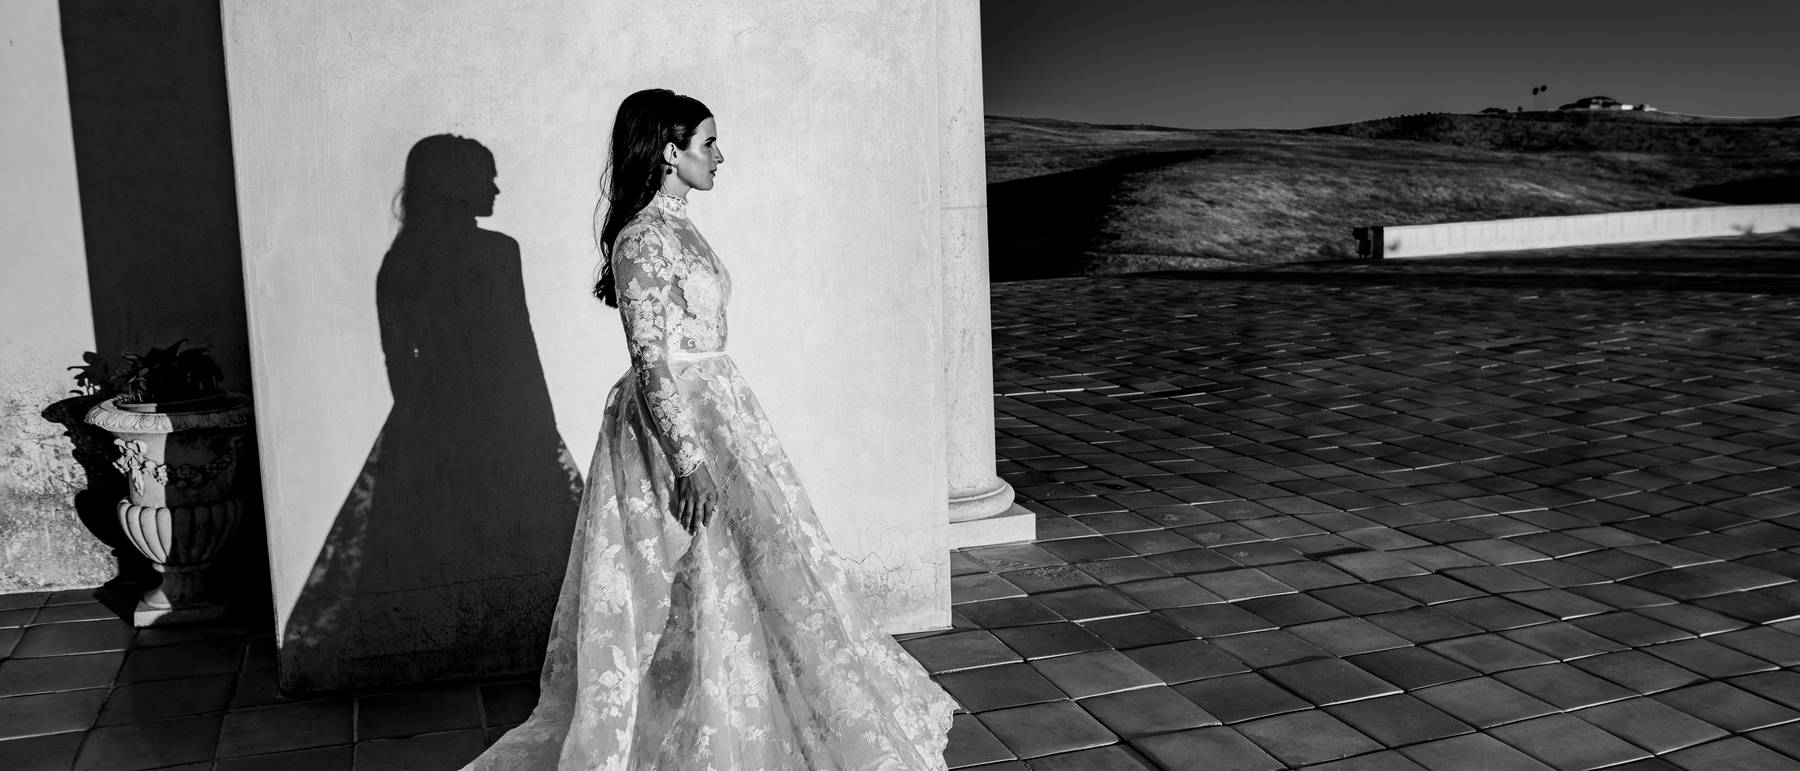 johnandjoseph-wedding-photographer-hz-slider-309